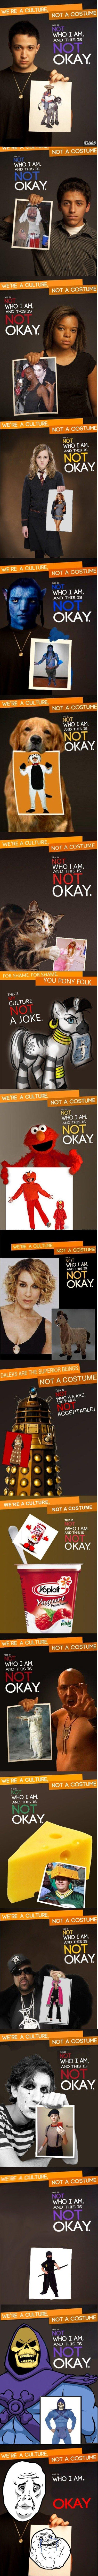 We're a Culture, Not a Costume. .